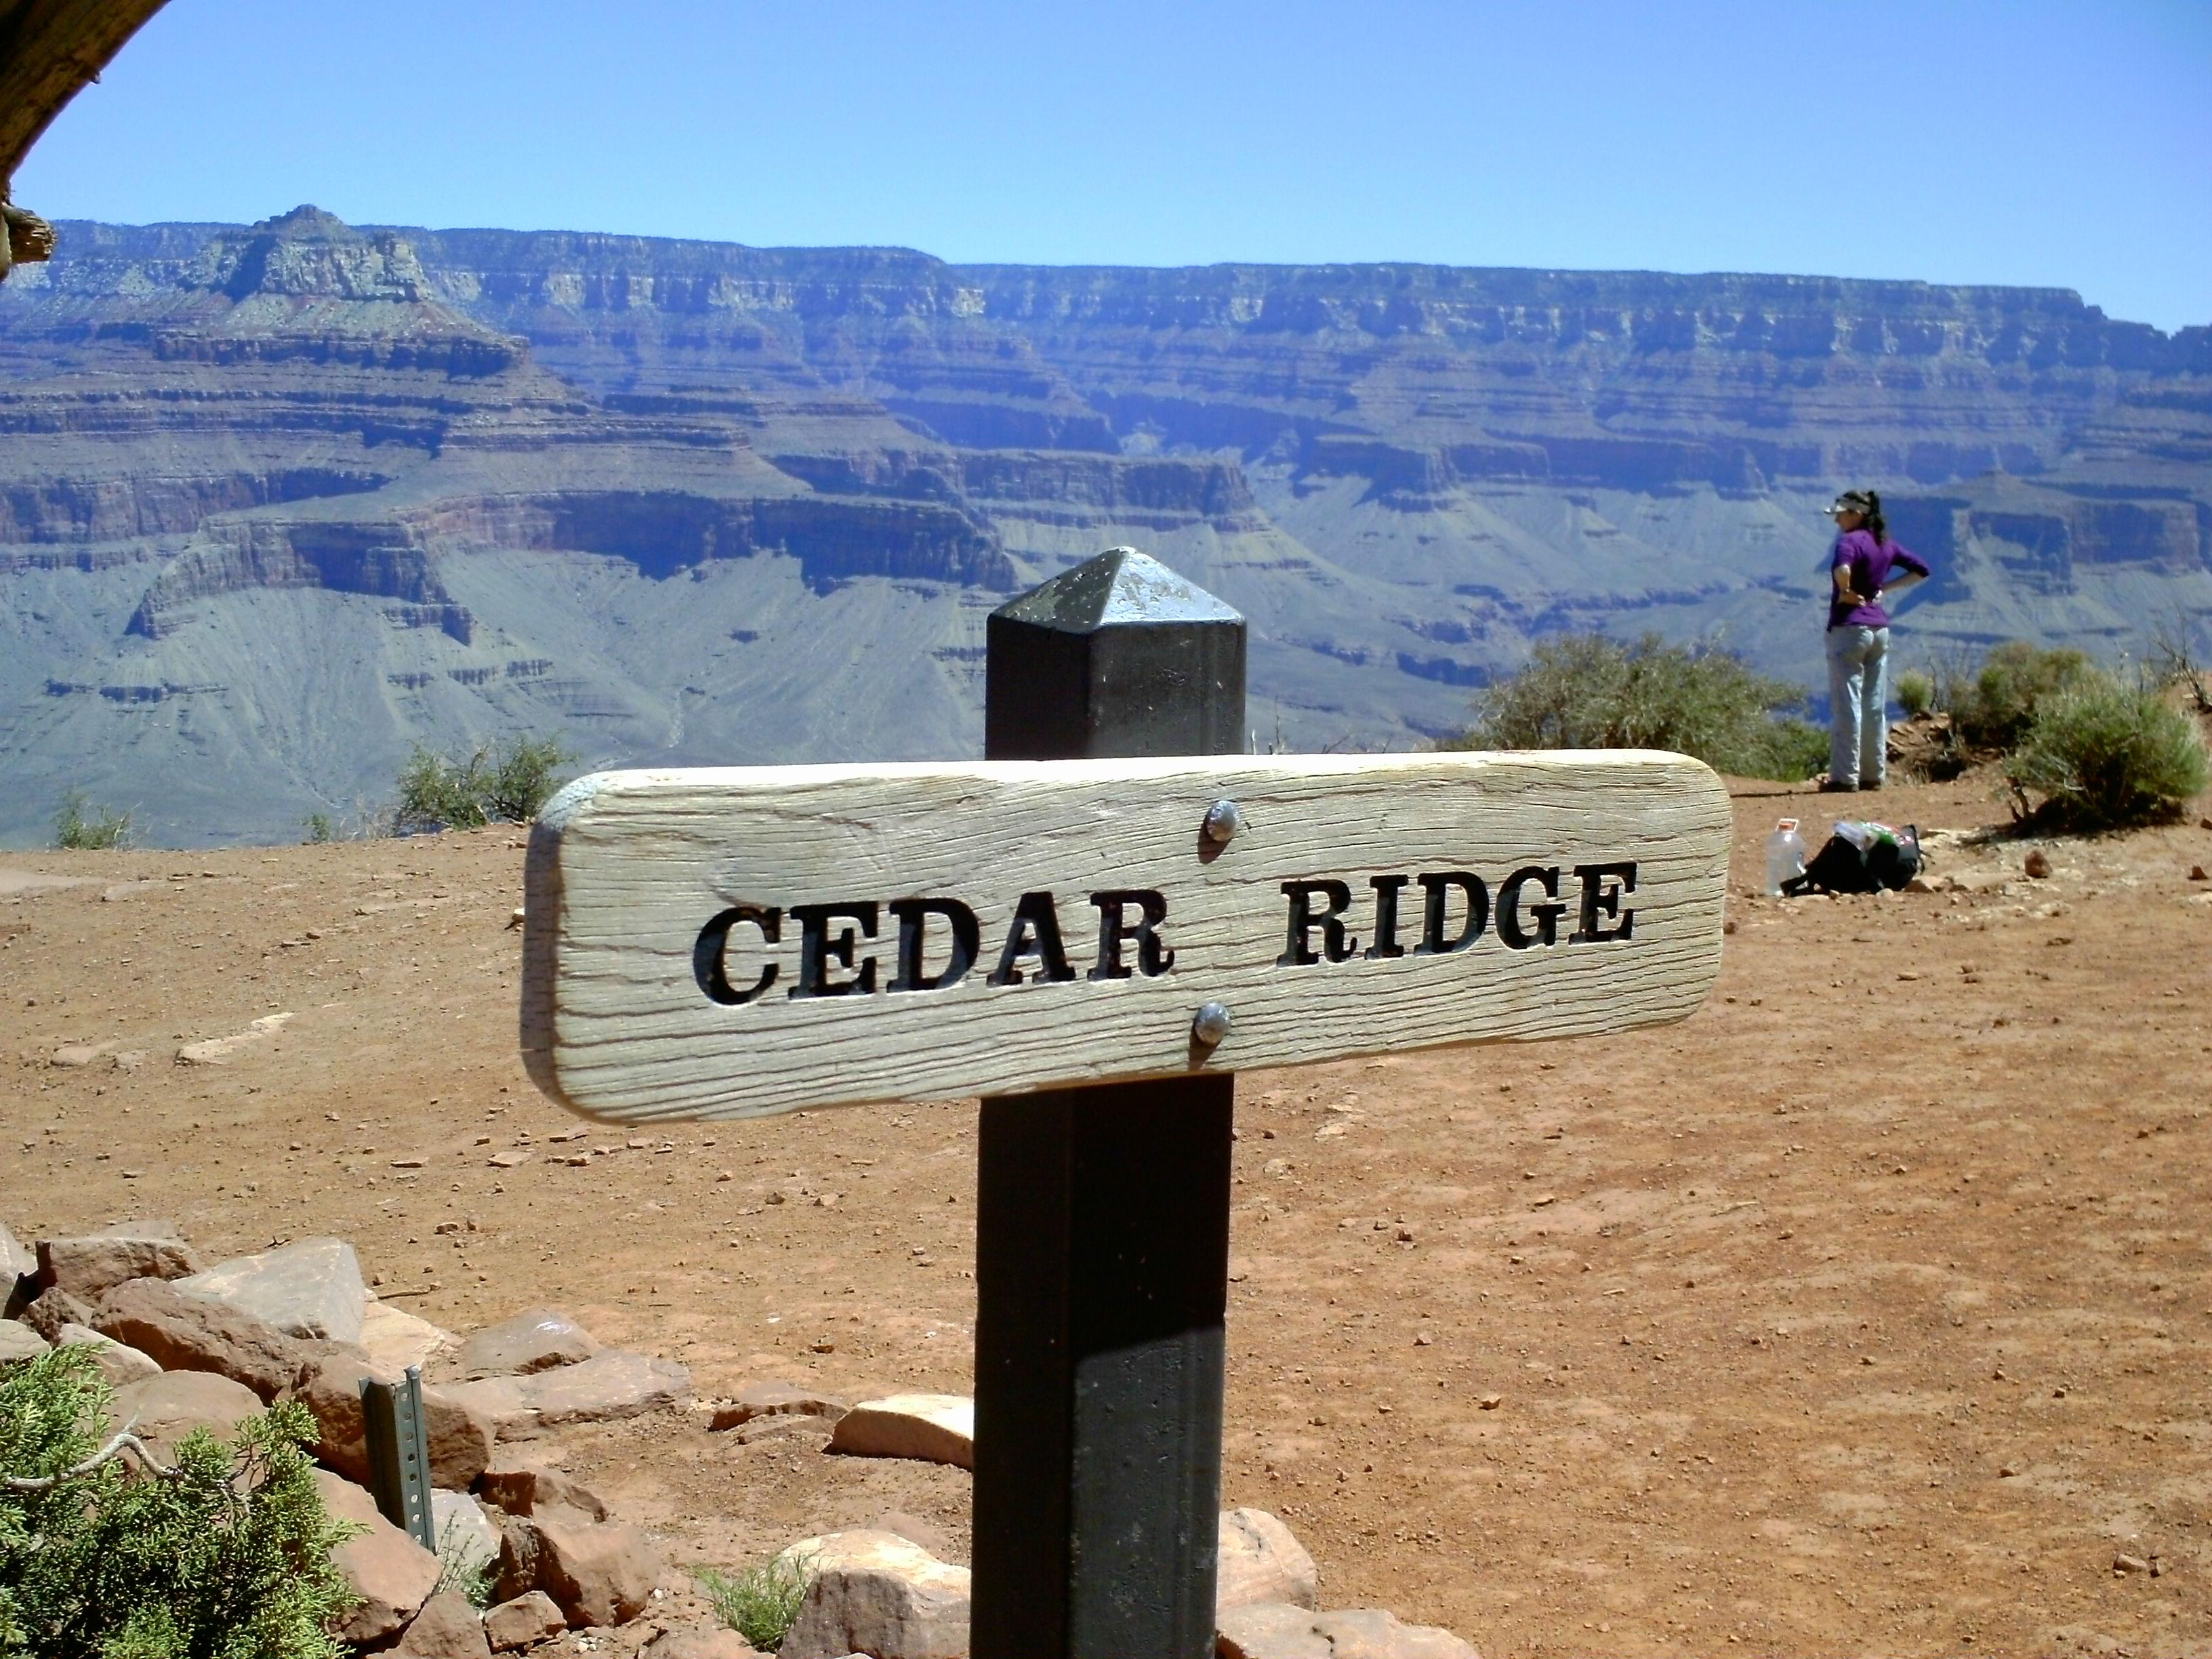 Grand canyon national park az explorerhawk 39 s blog for Cedar ridge